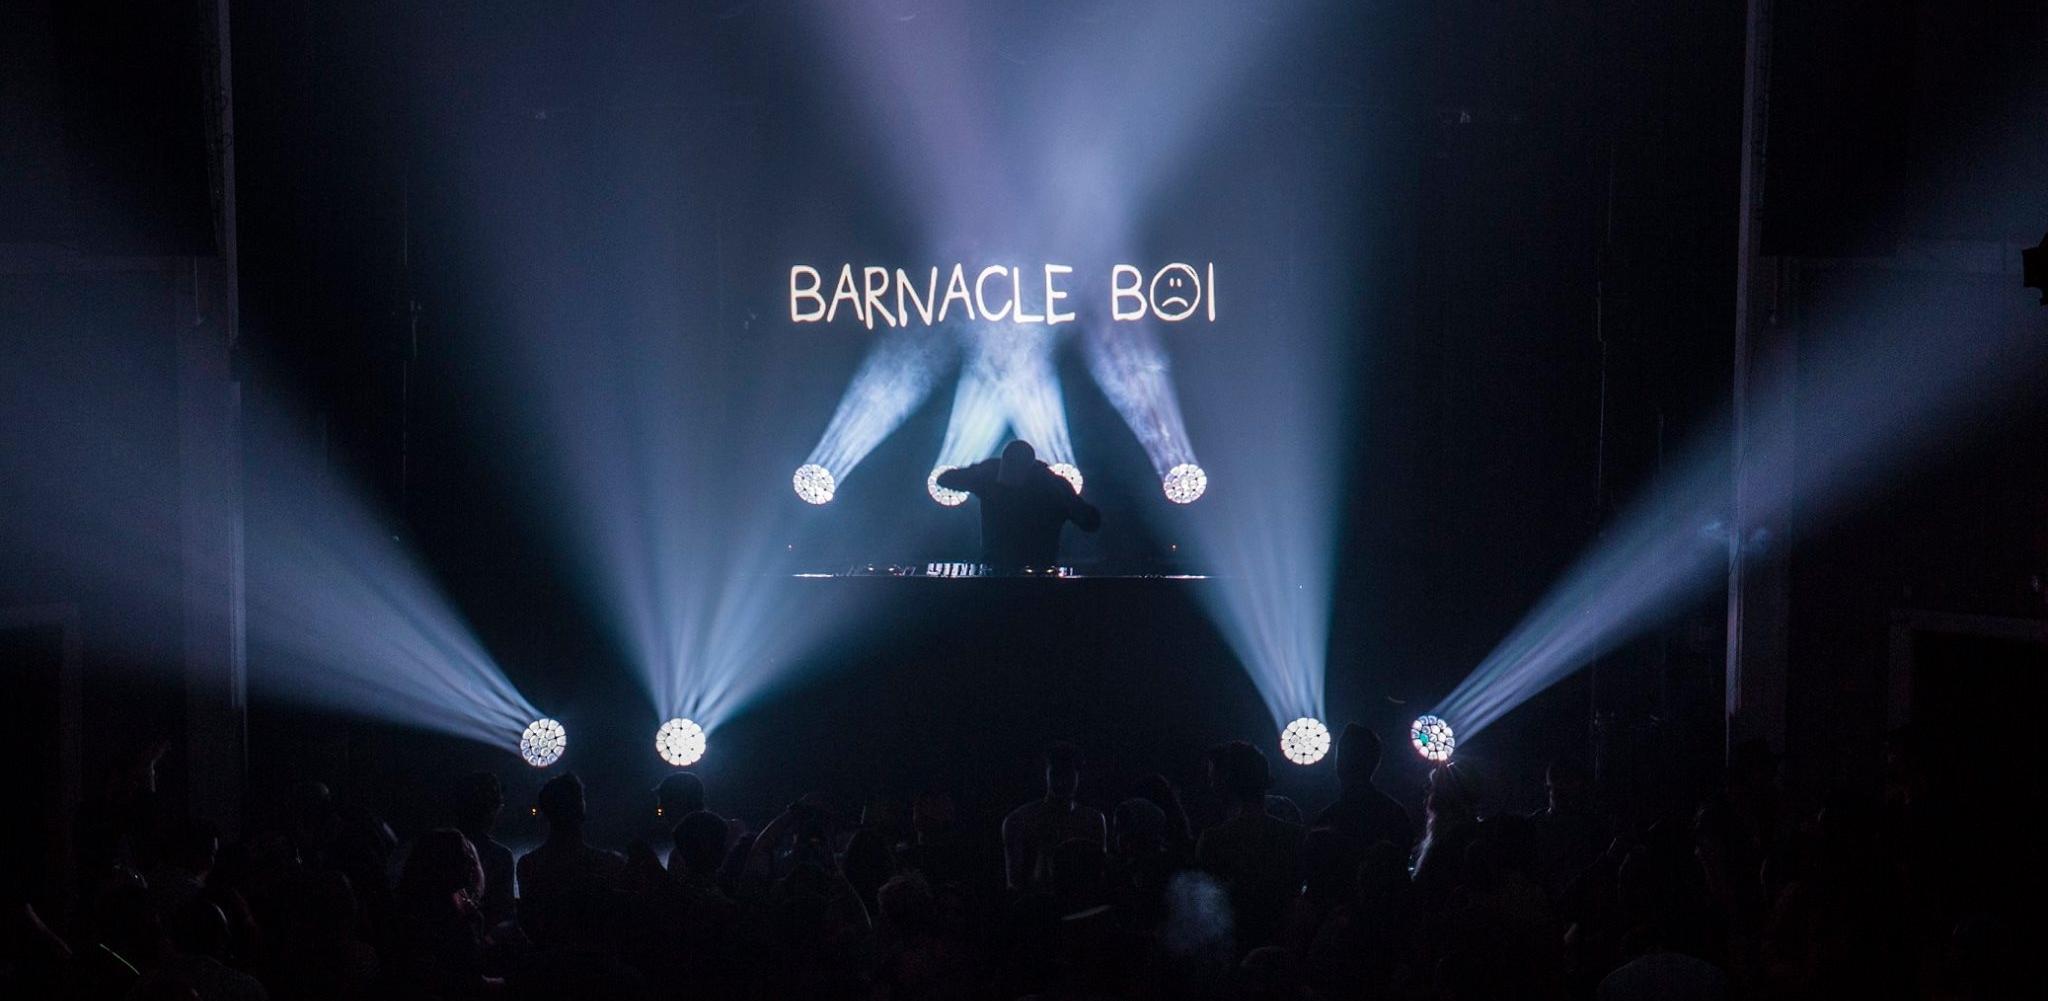 bb show shot 1 .jpg